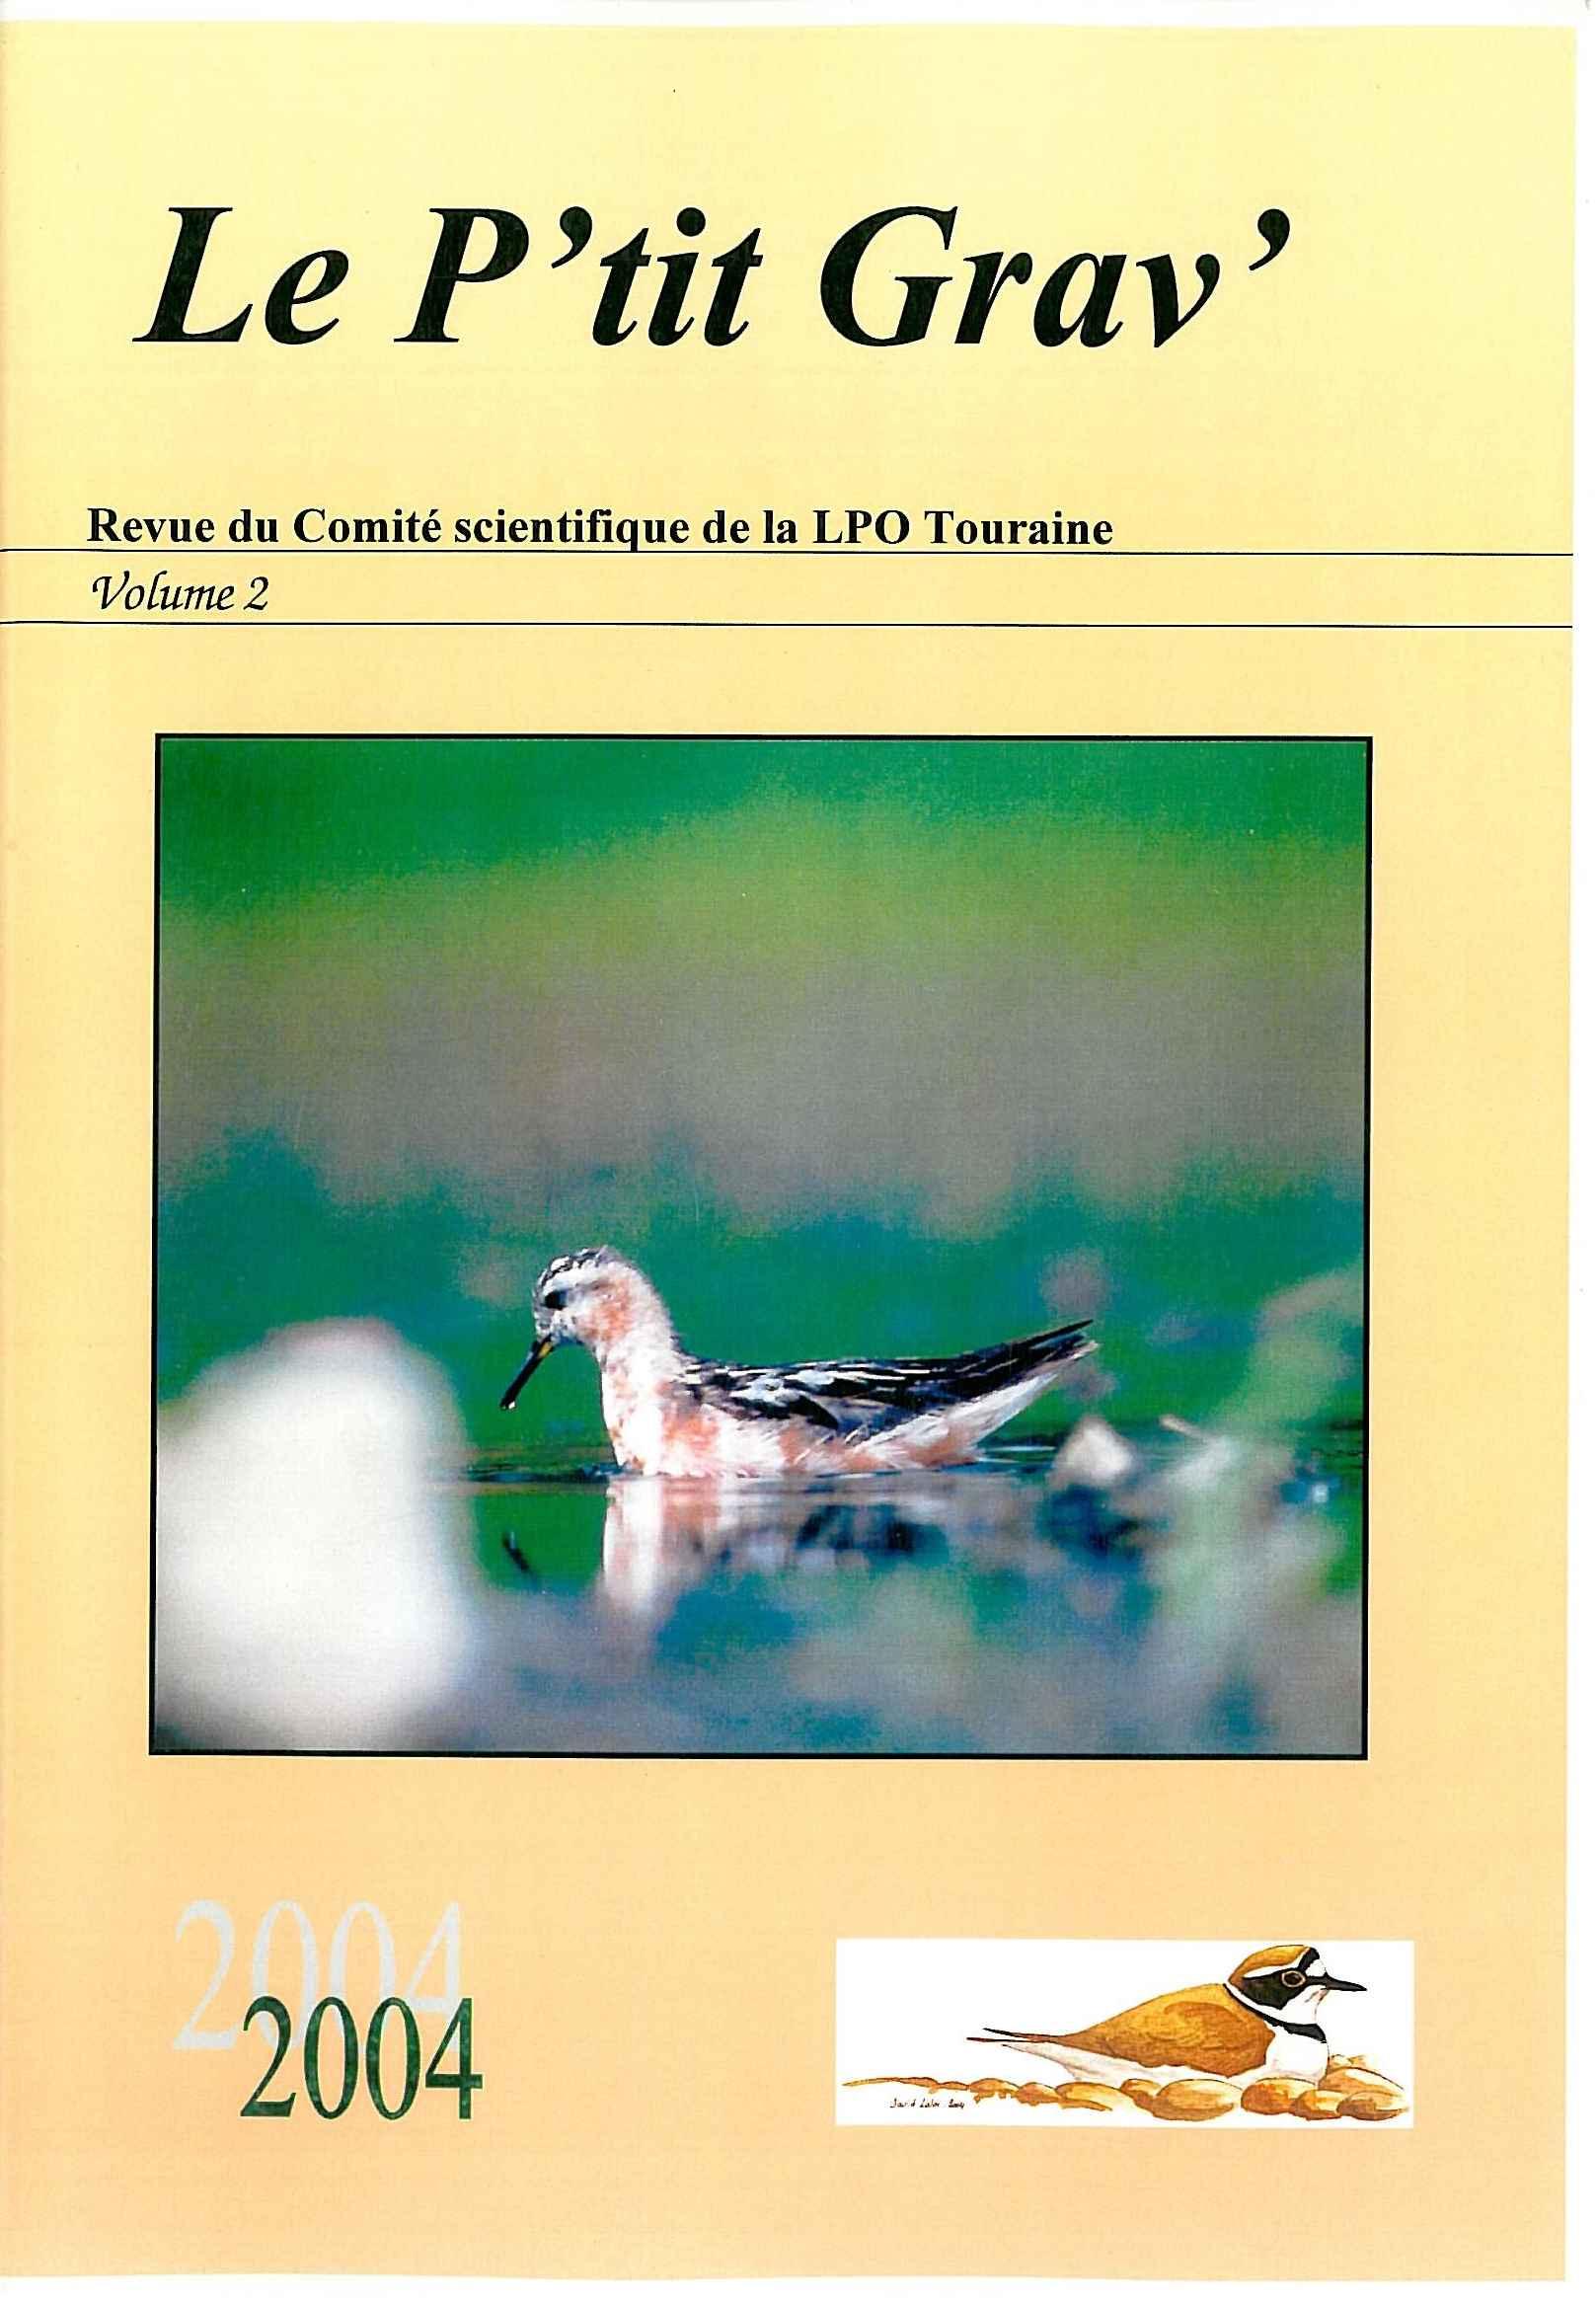 https://cdnfiles1.biolovision.net/www.faune-touraine.org/userfiles/MonDossier/PtitGravvol2.jpg